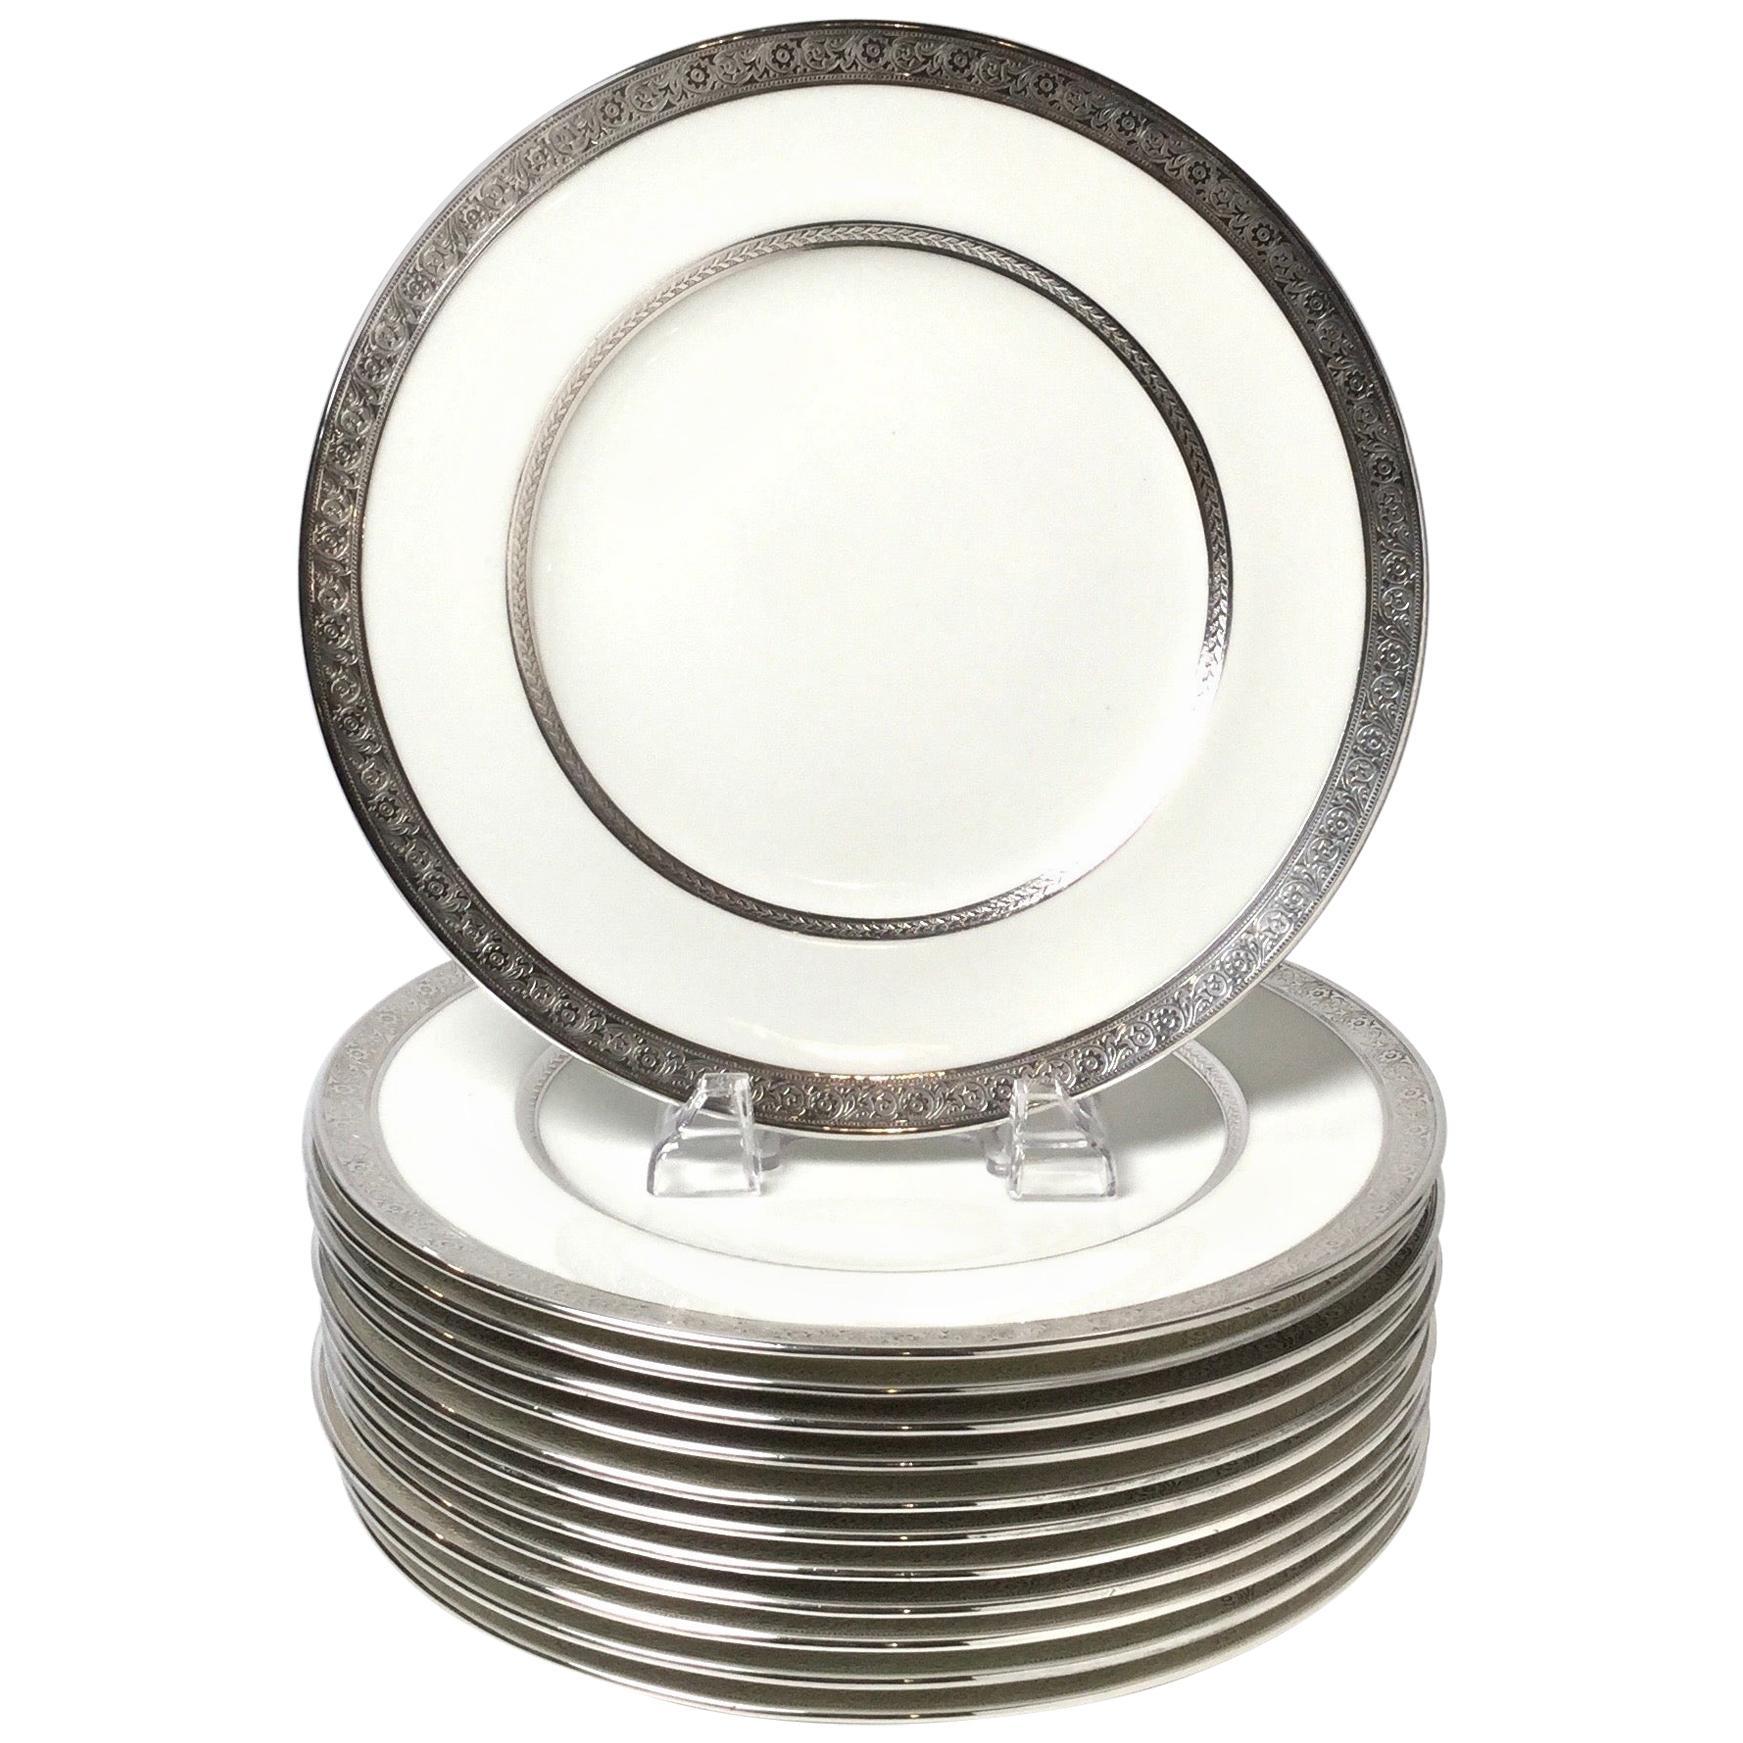 Set of Twelve Sterling Overlay Service Dinner Plates by Cauldon